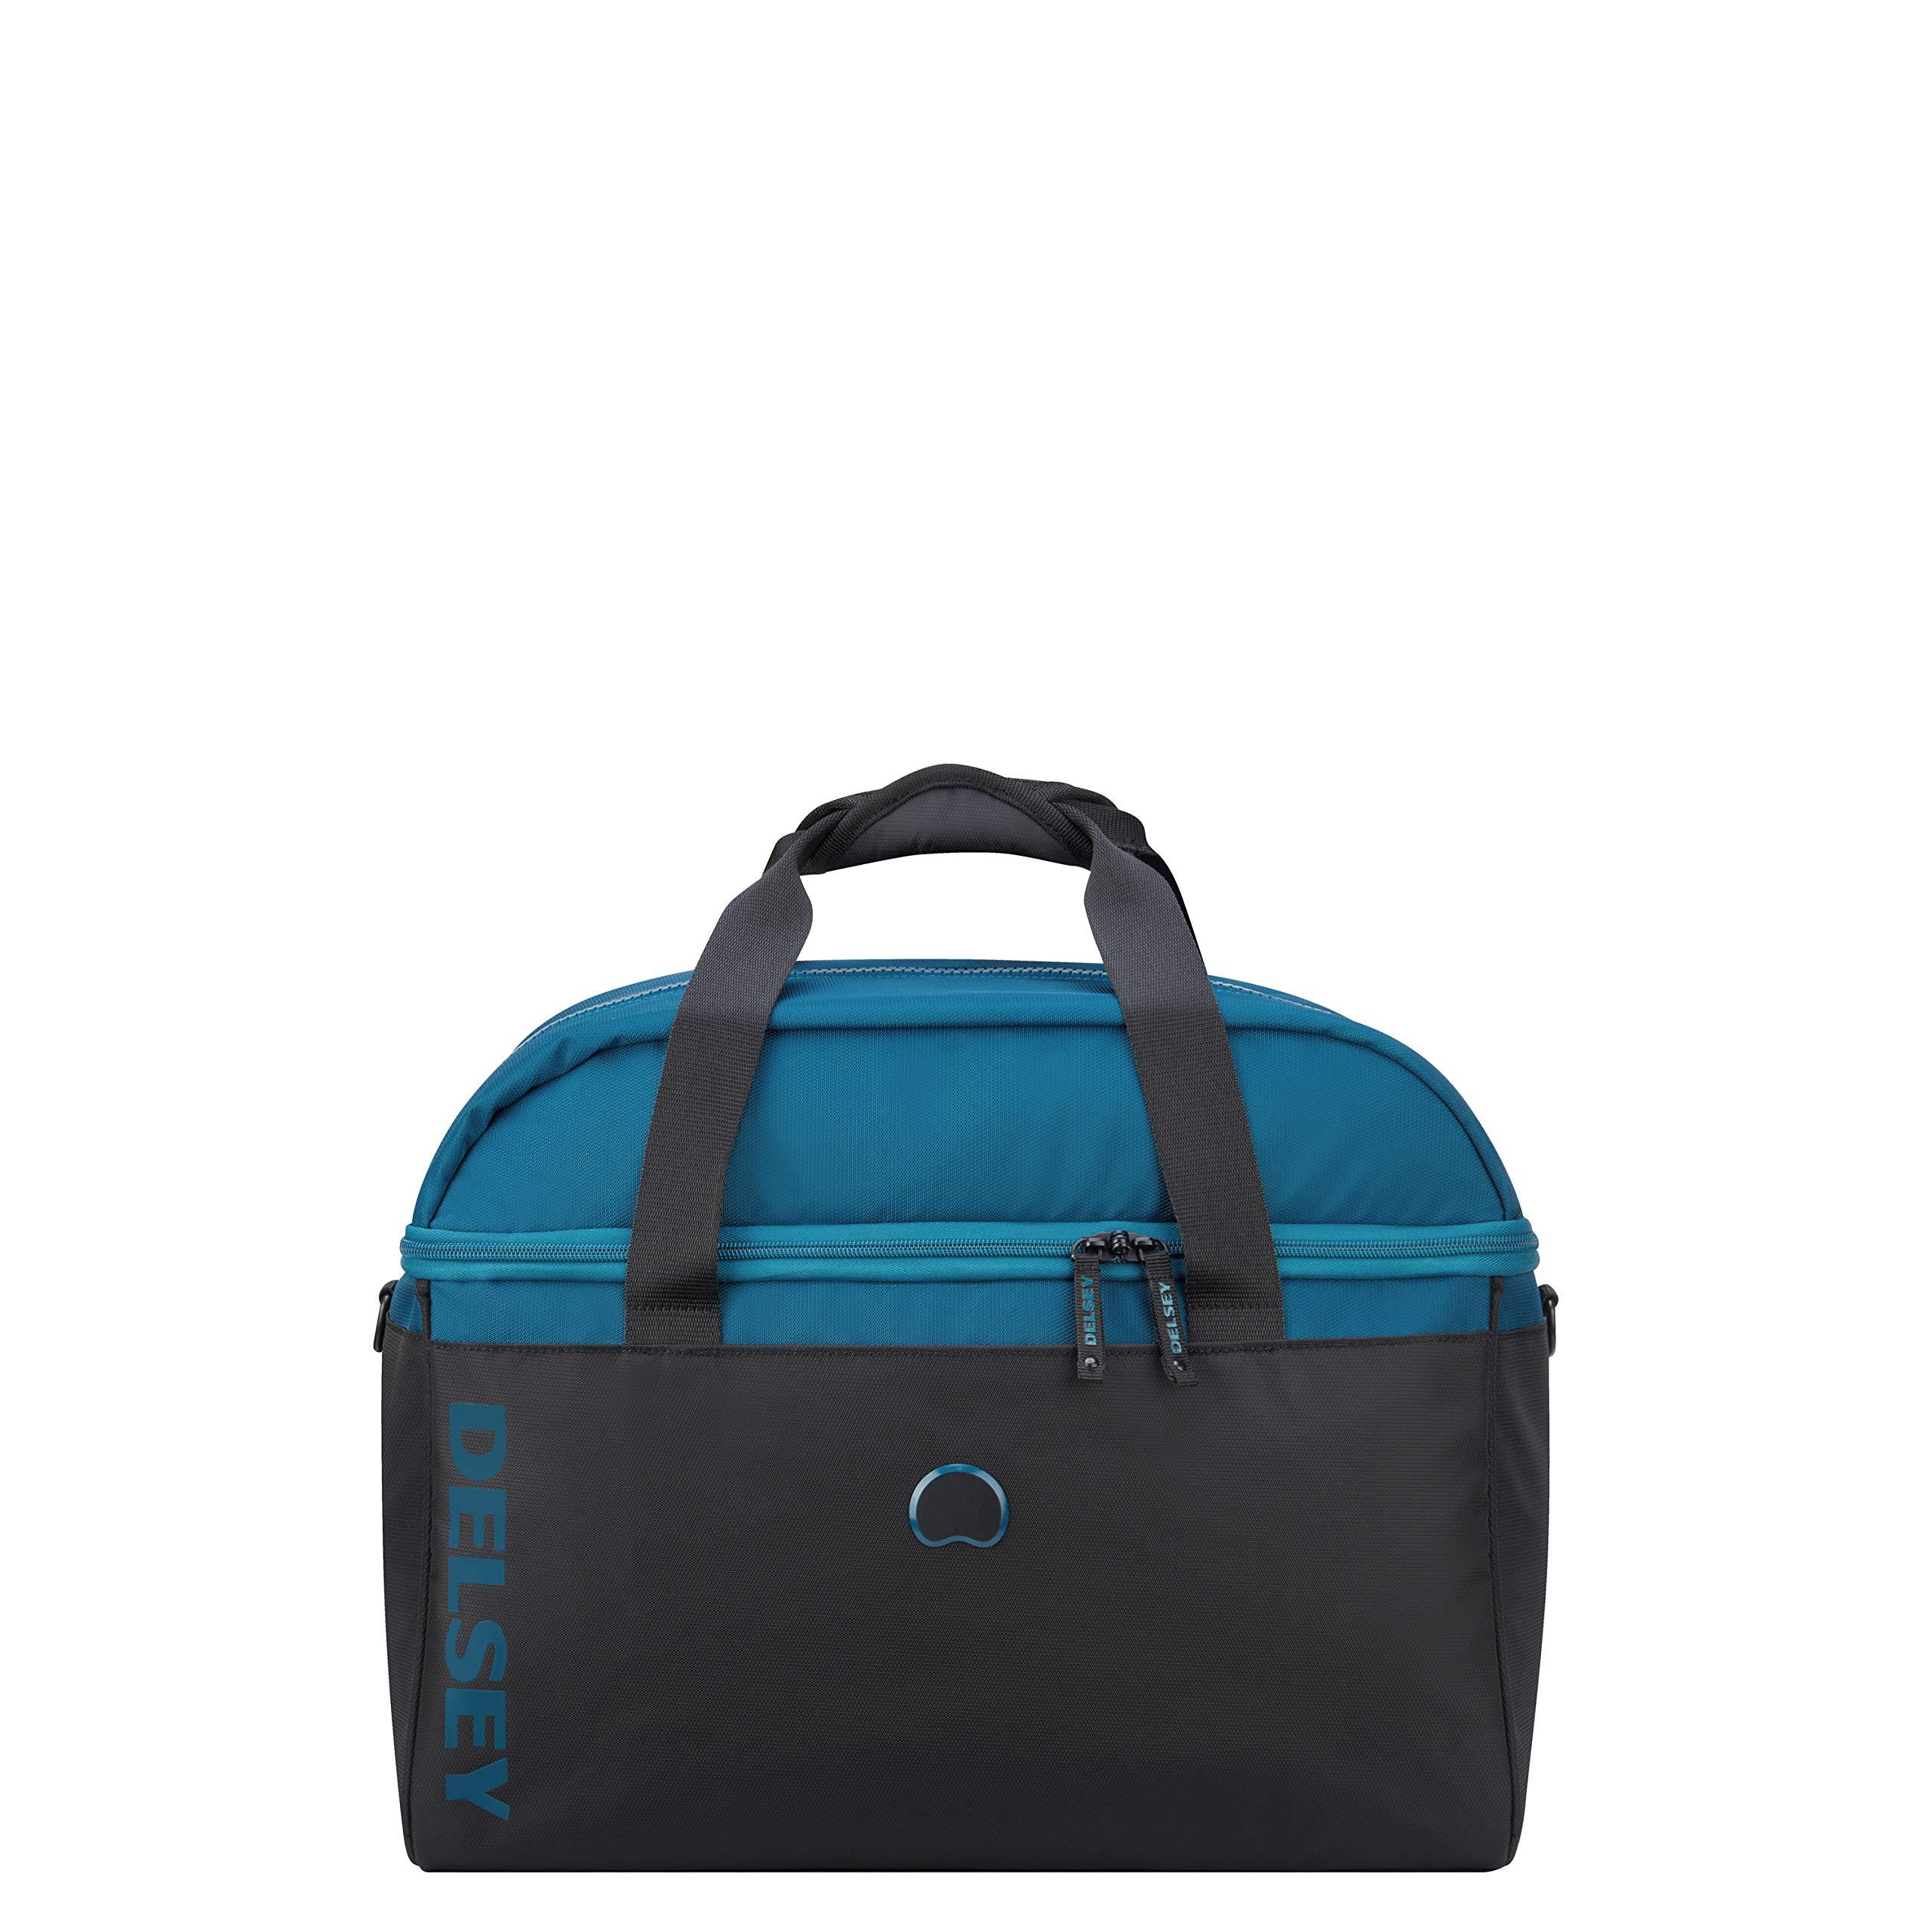 Cerd/á Chase Valise Bleu Azul 3 liters 31 cm